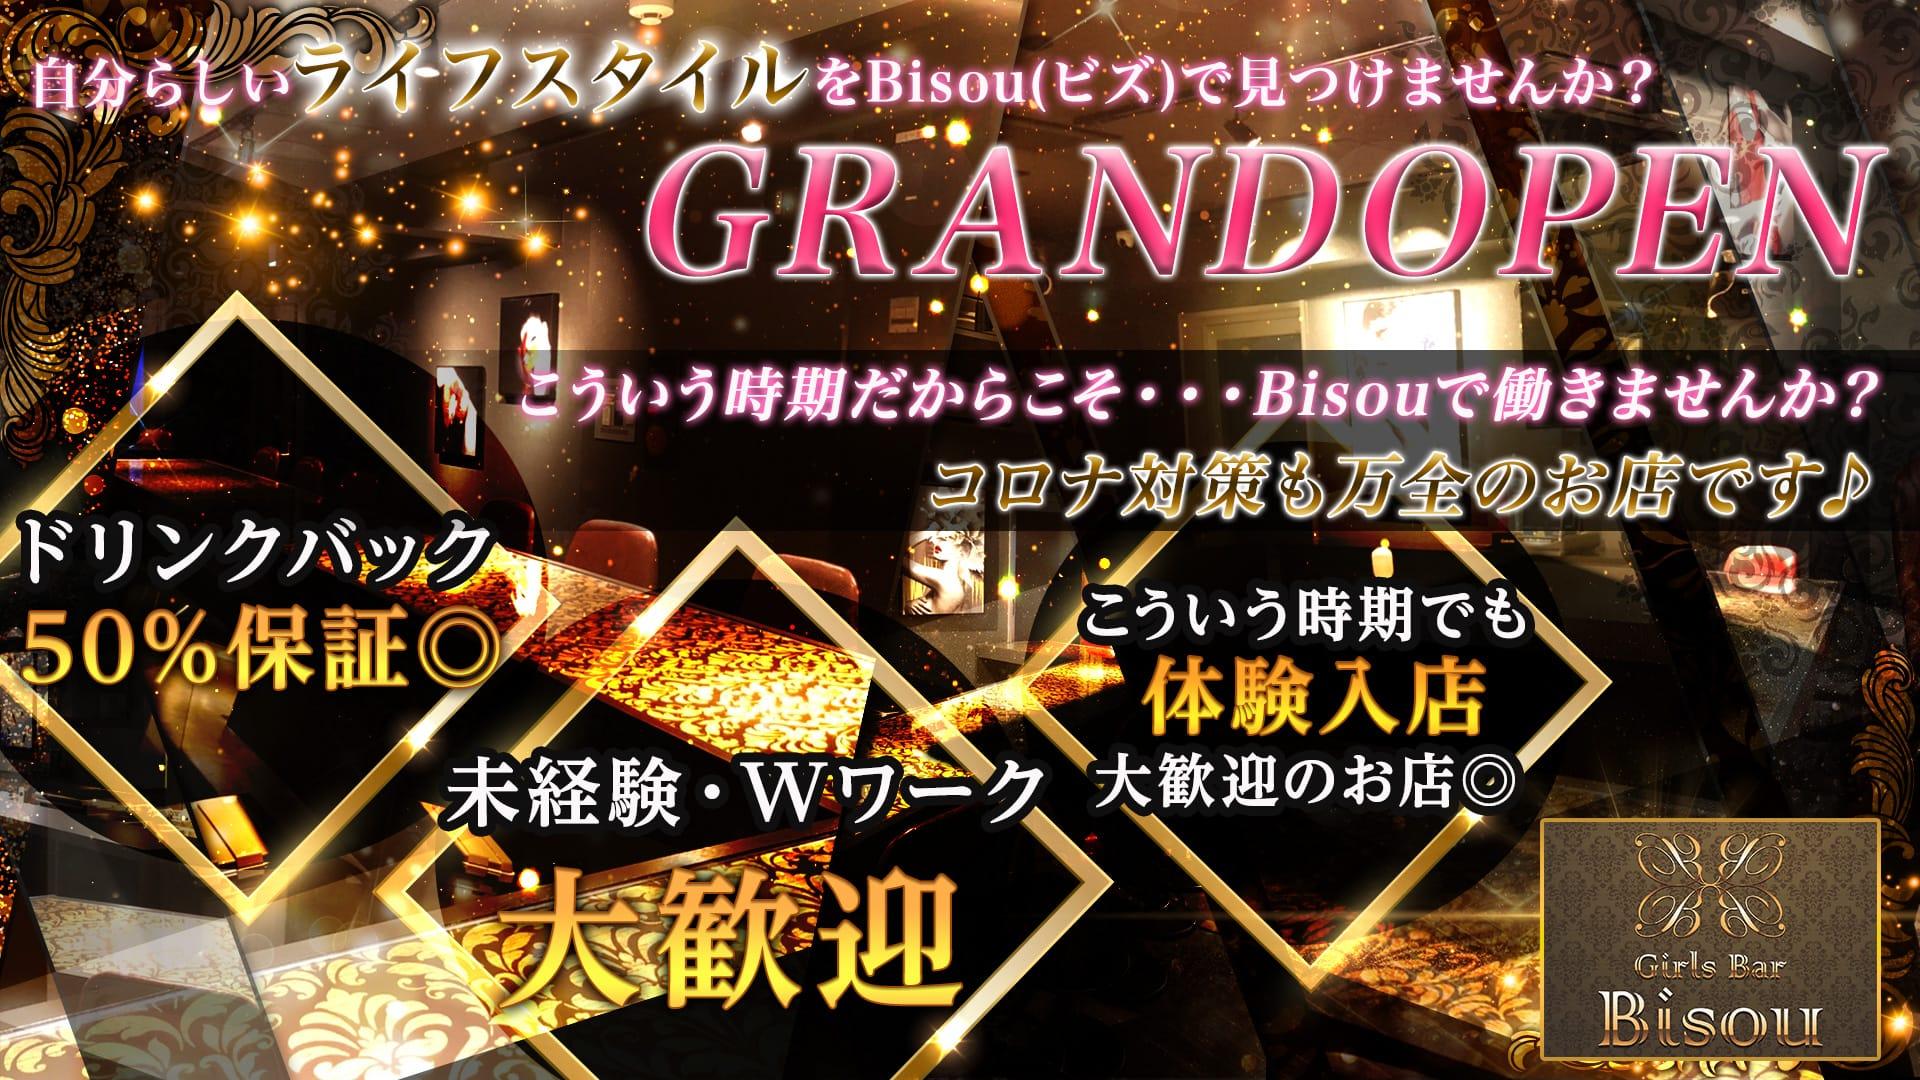 Girls Bar Bisou(ビズ) 神田ガールズバー TOP画像